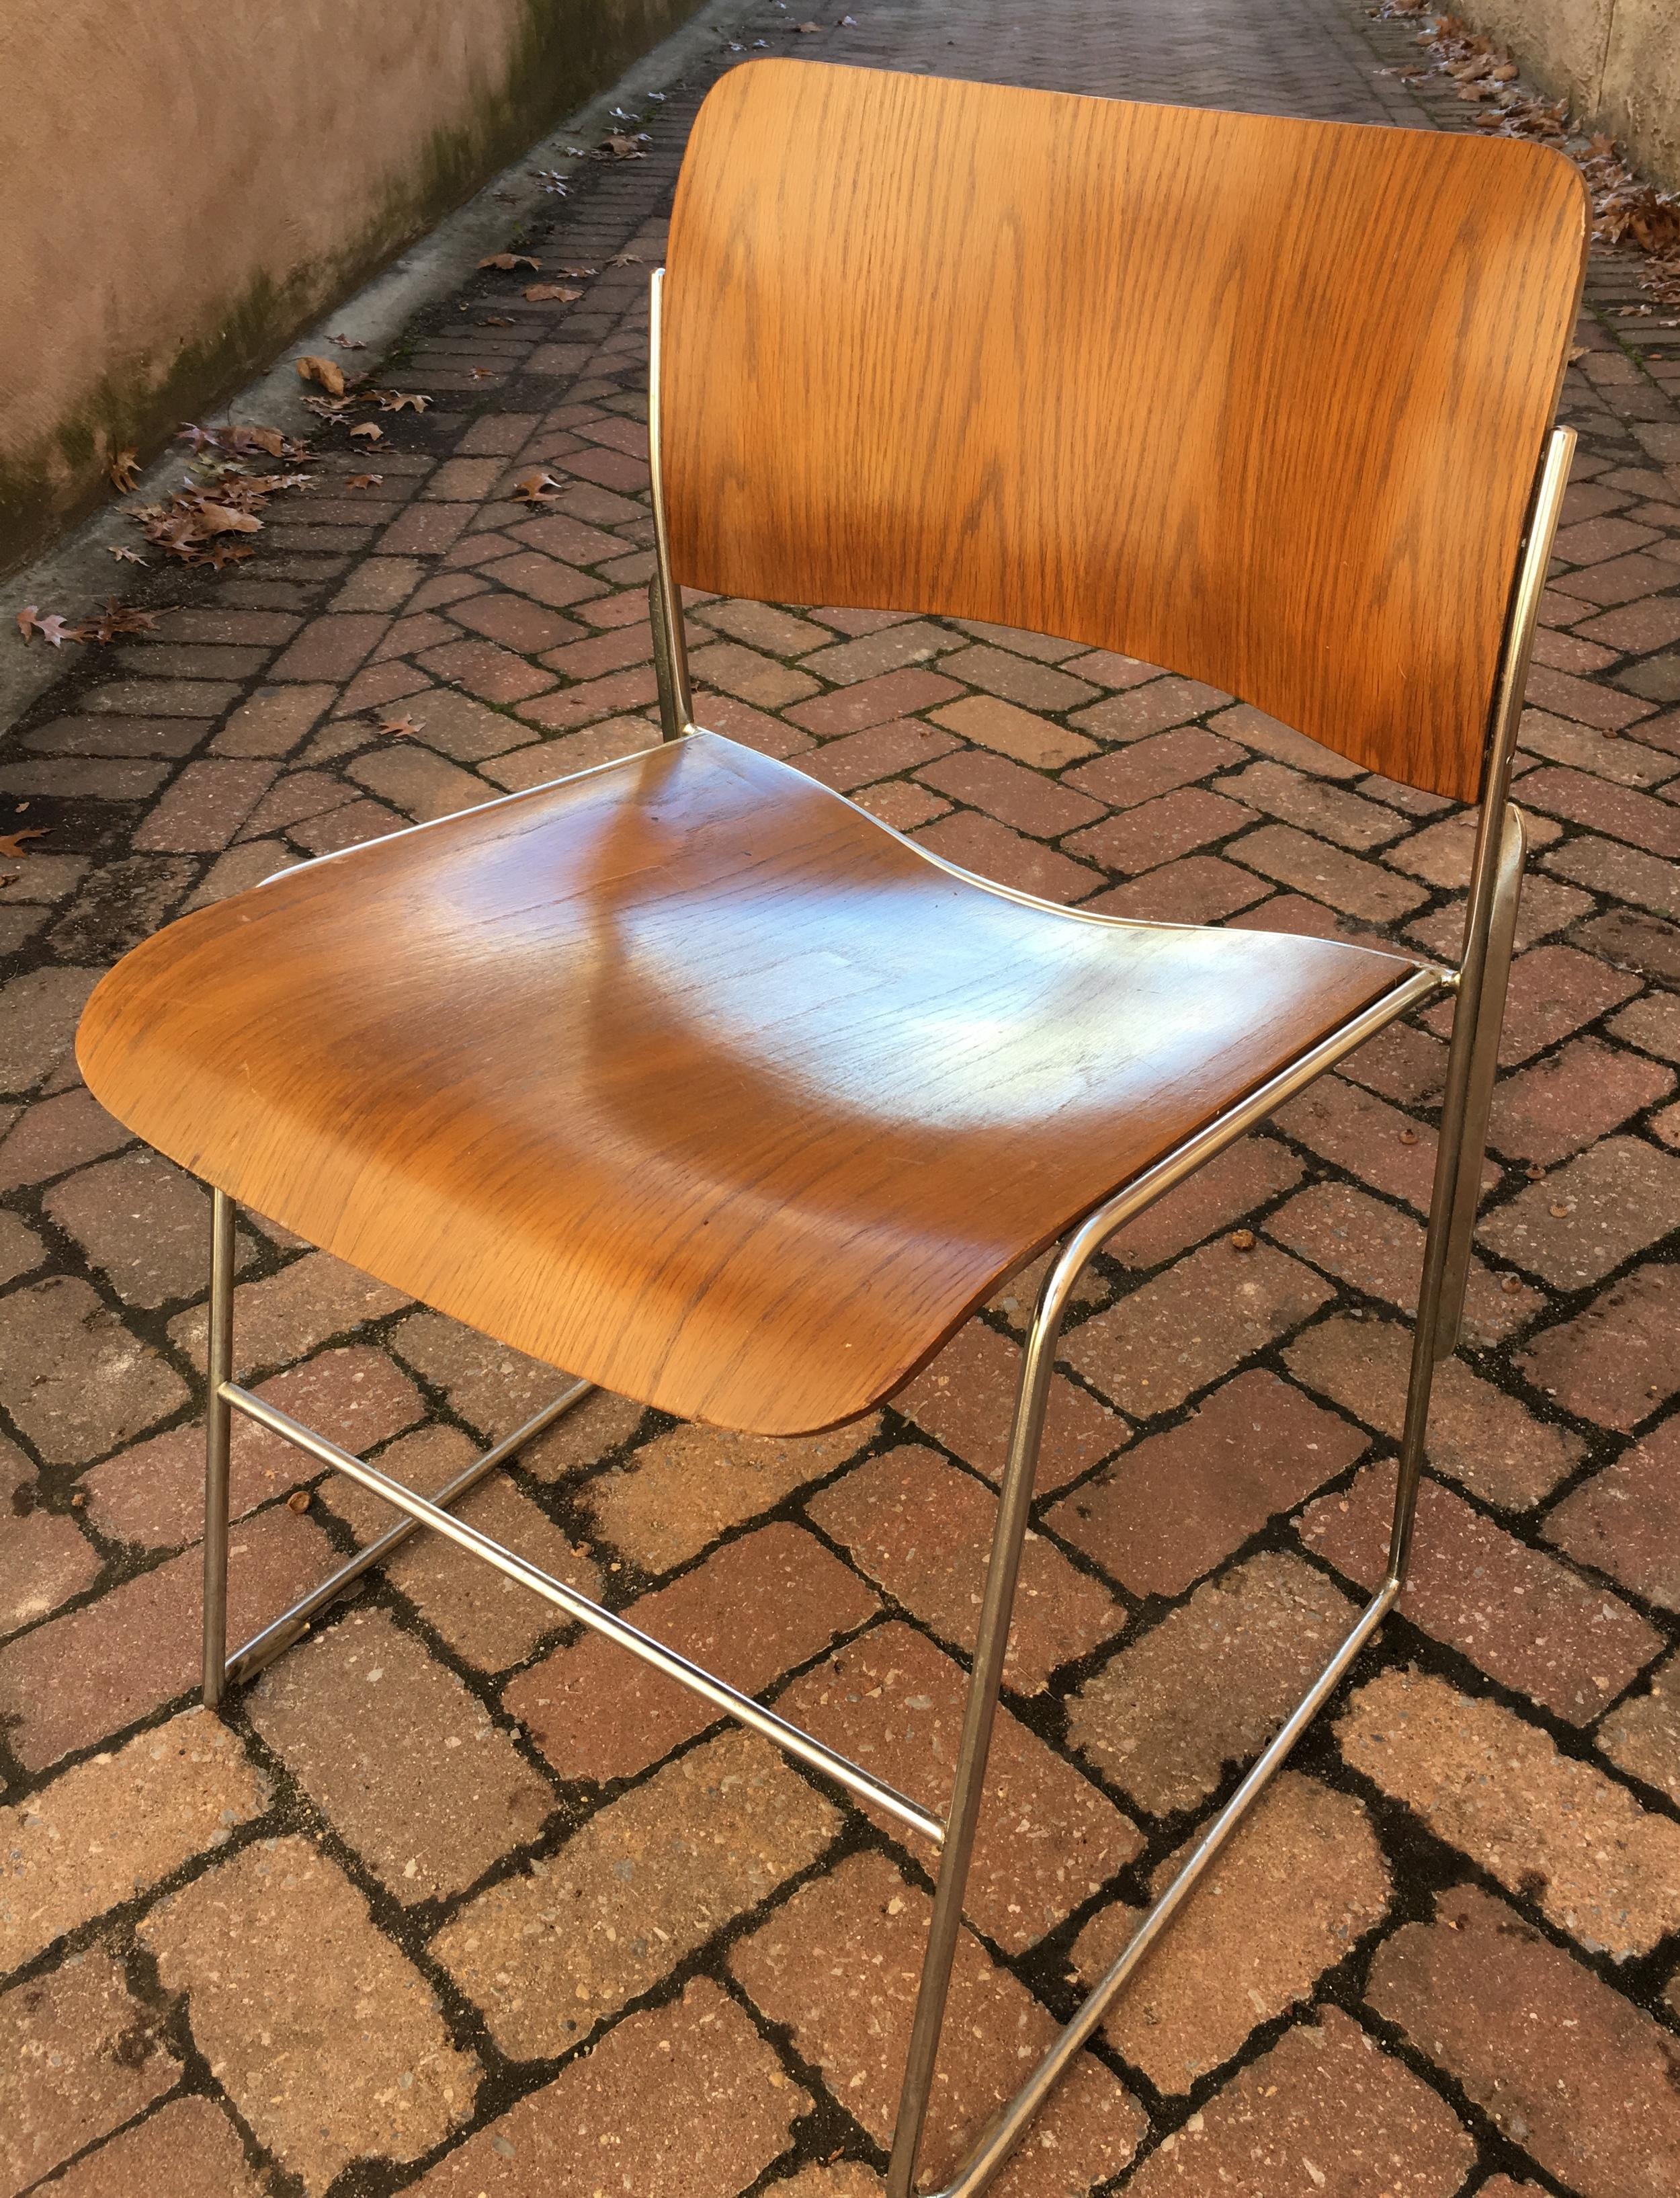 david rowland metal chair ez posture 40 4 dig this img 0520 jpg